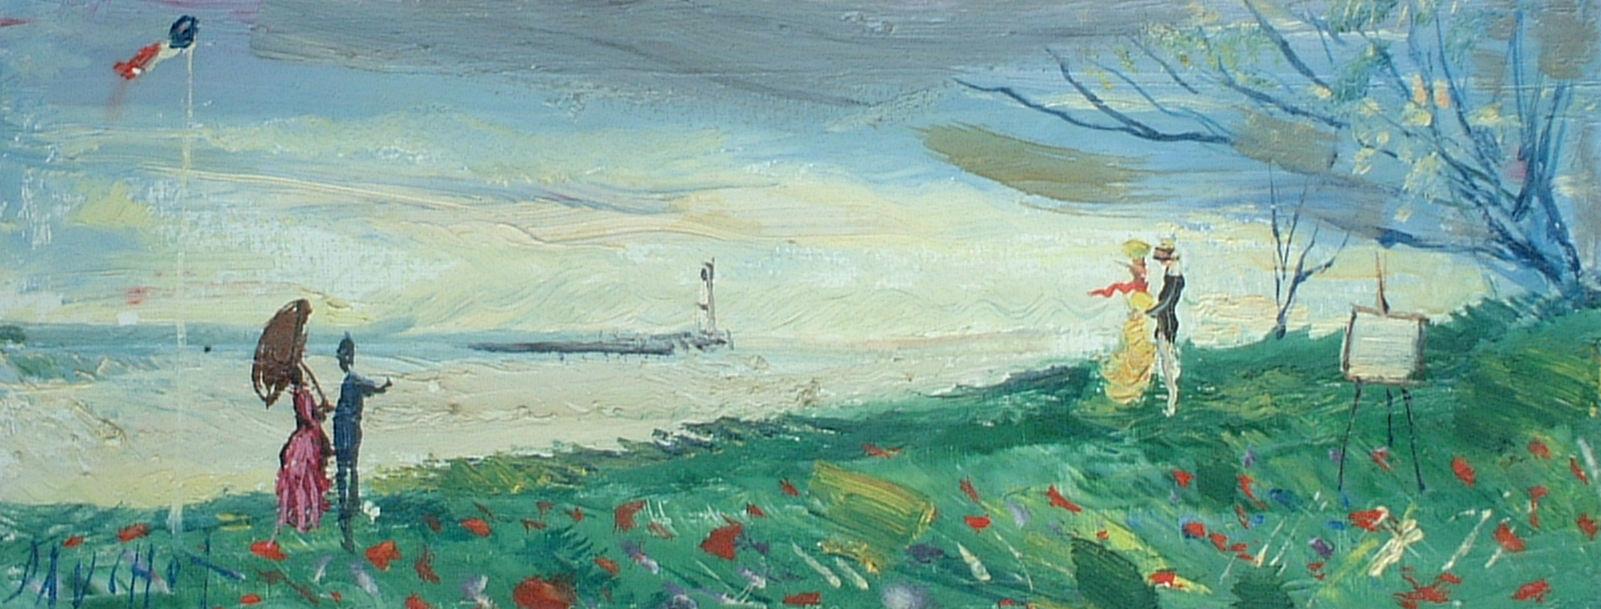 Artist: Gabriel Dauchot Title: Spring at Shore Size: 7.5in x 18.5in